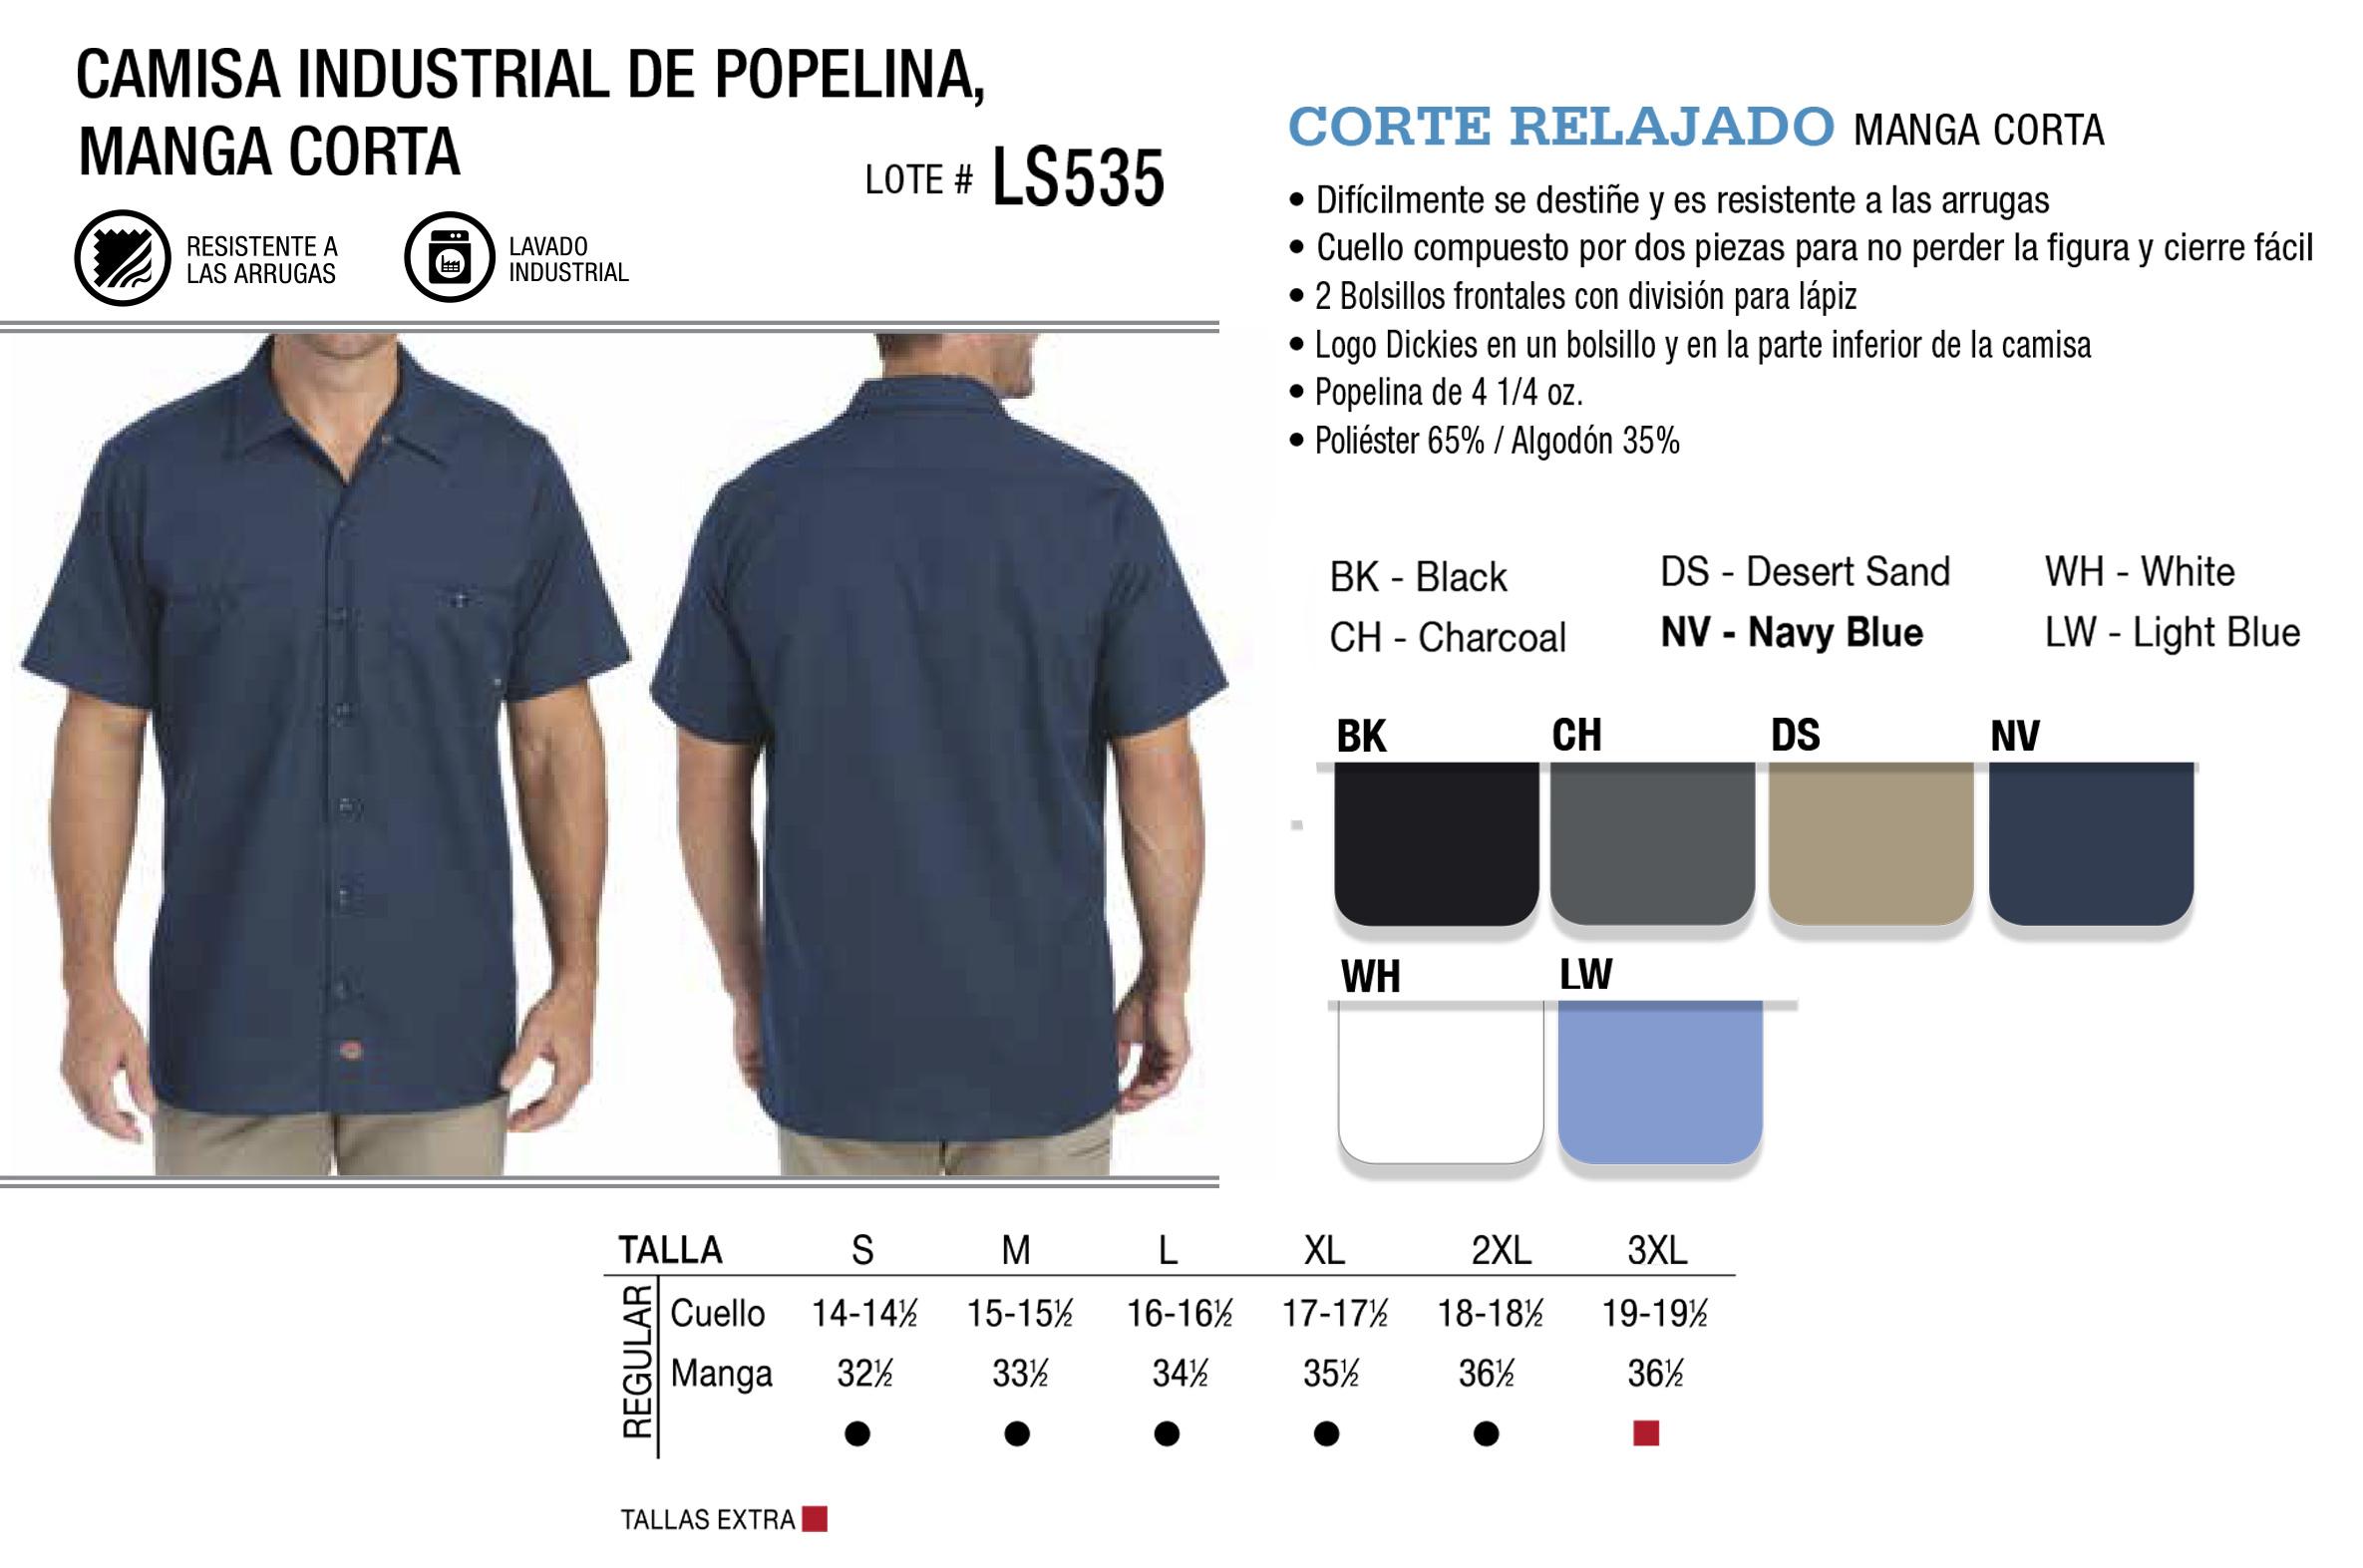 Camisa industrial de popelina. Manga Corta. LS535